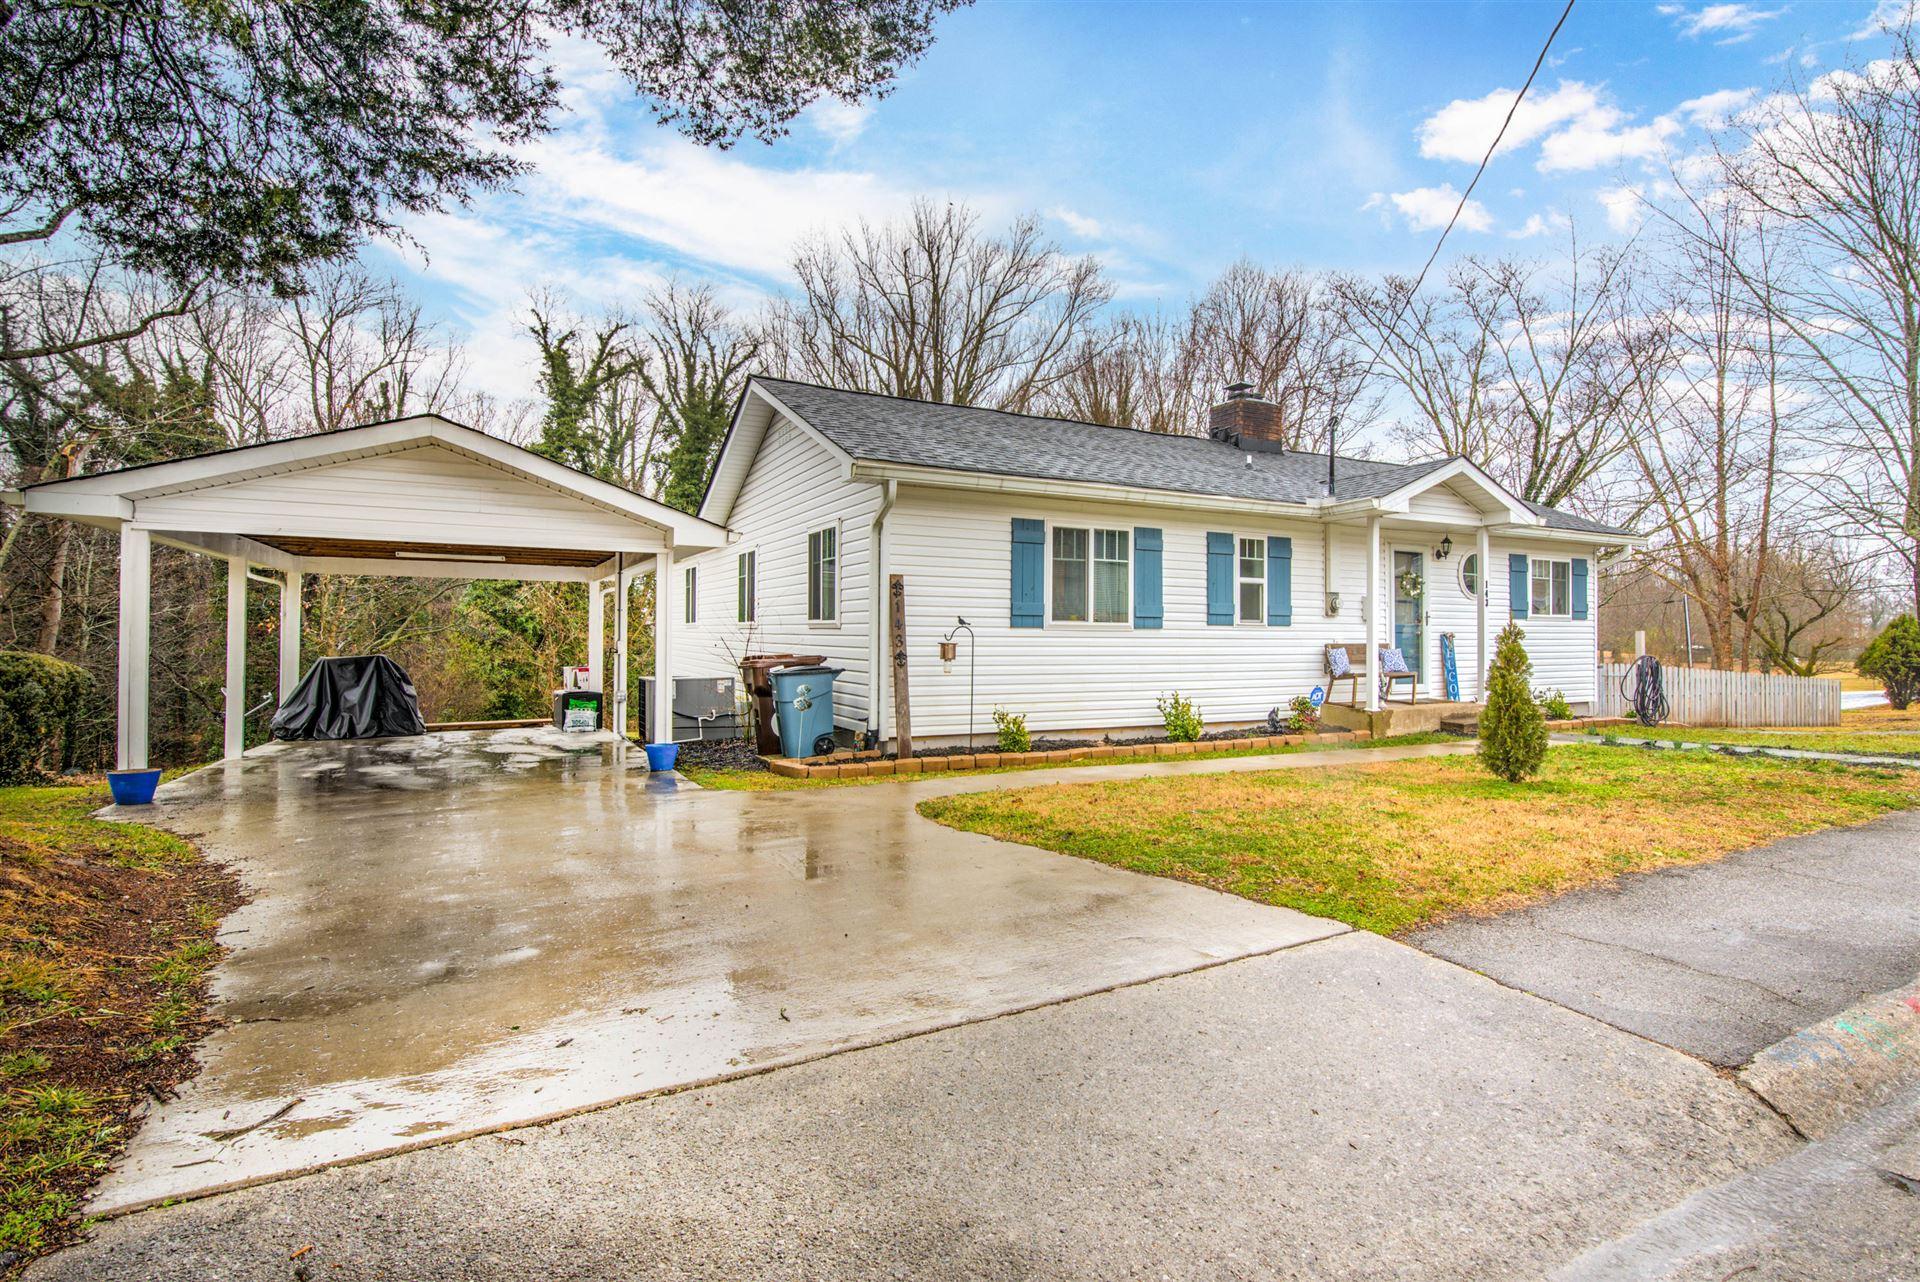 Photo of 143 Outer Drive, Oak Ridge, TN 37830 (MLS # 1143147)